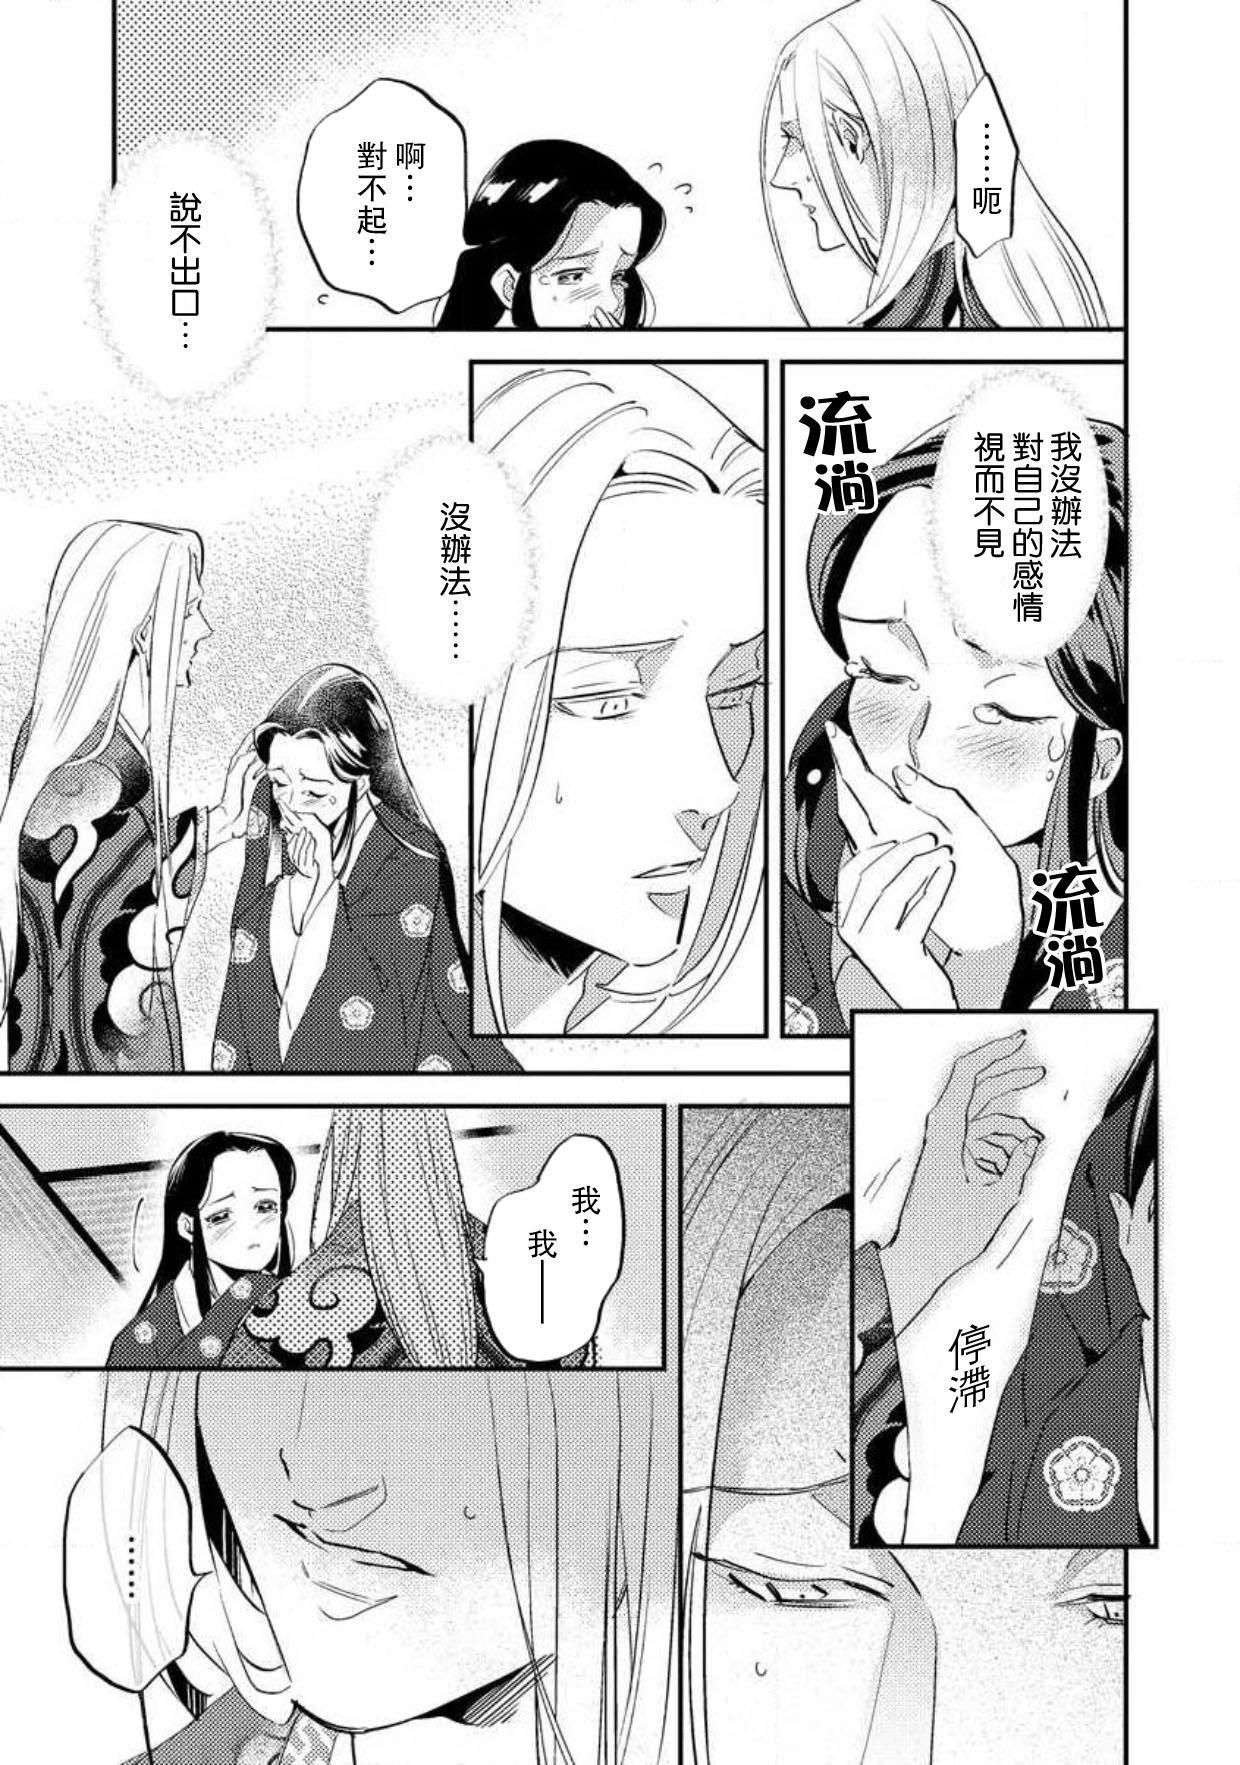 Oeyama suimutan utsukushiki oni no toraware hime | 大江山醉夢逸話 美麗的鬼與被囚禁的公主 Ch. 1-8 170